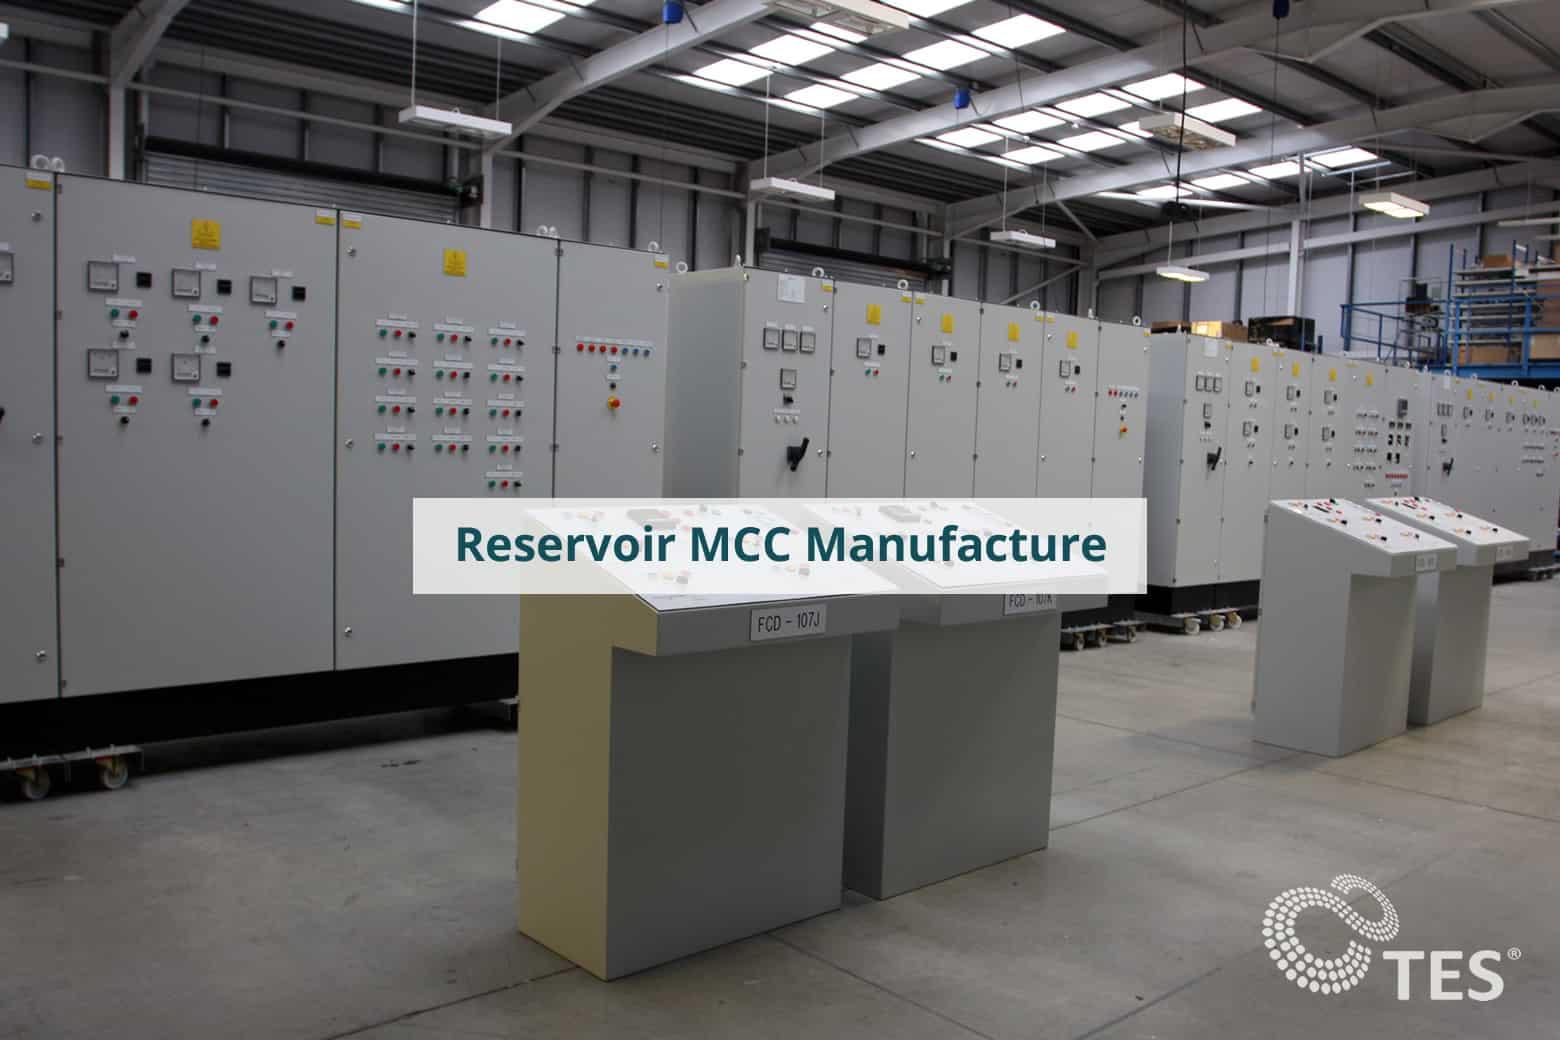 Reservoir MCC Manufacture